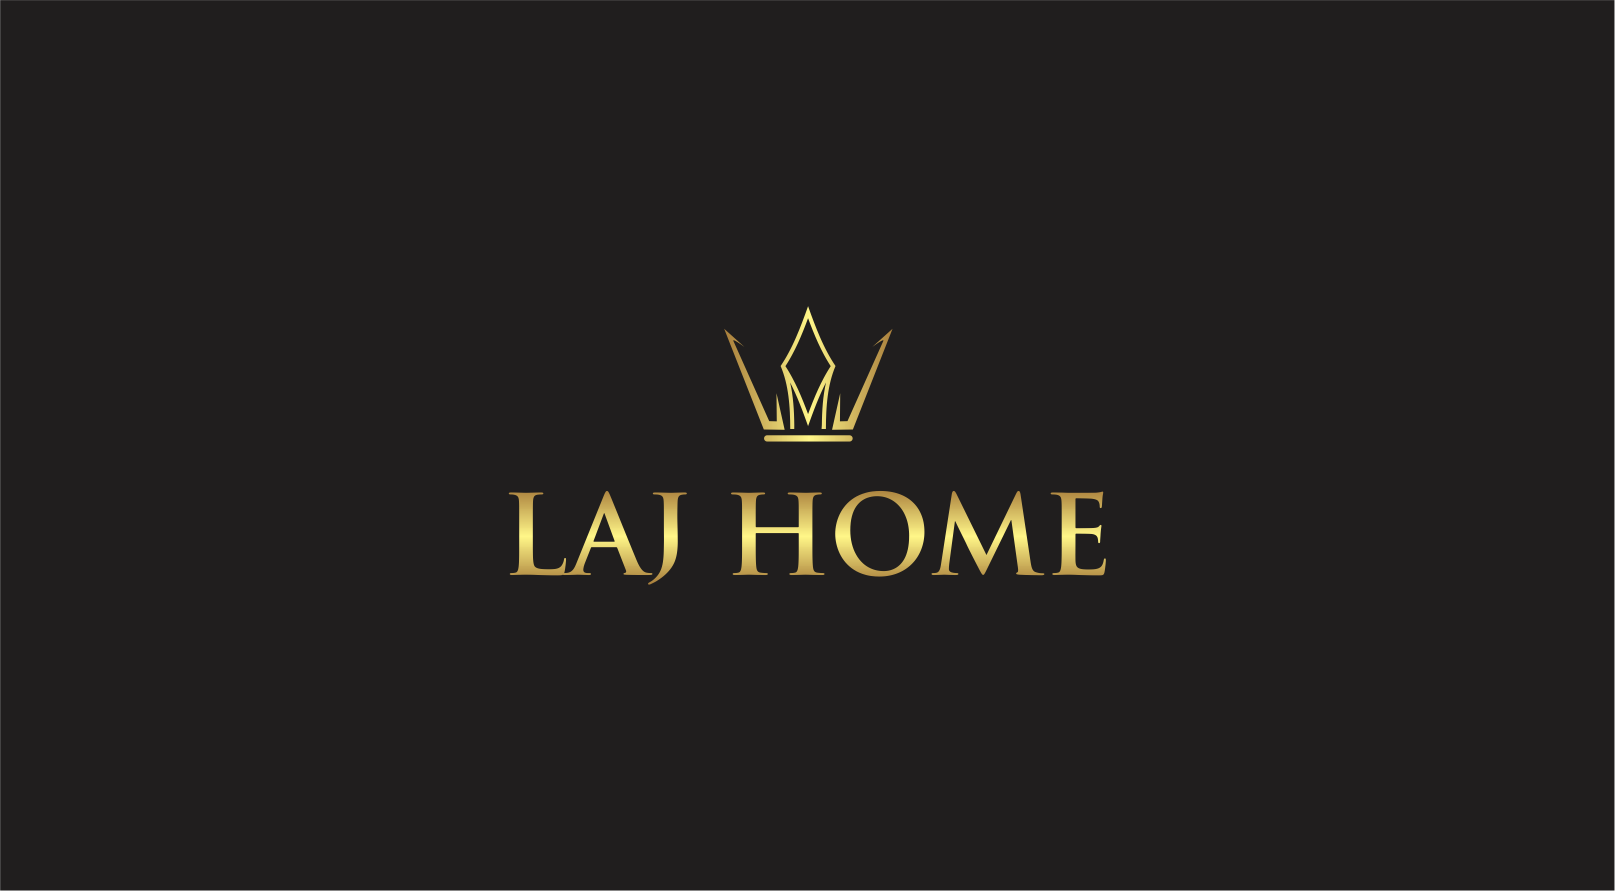 Logo Design by Private User - Entry No. 9 in the Logo Design Contest Unique Logo Design Wanted for LAJ home.